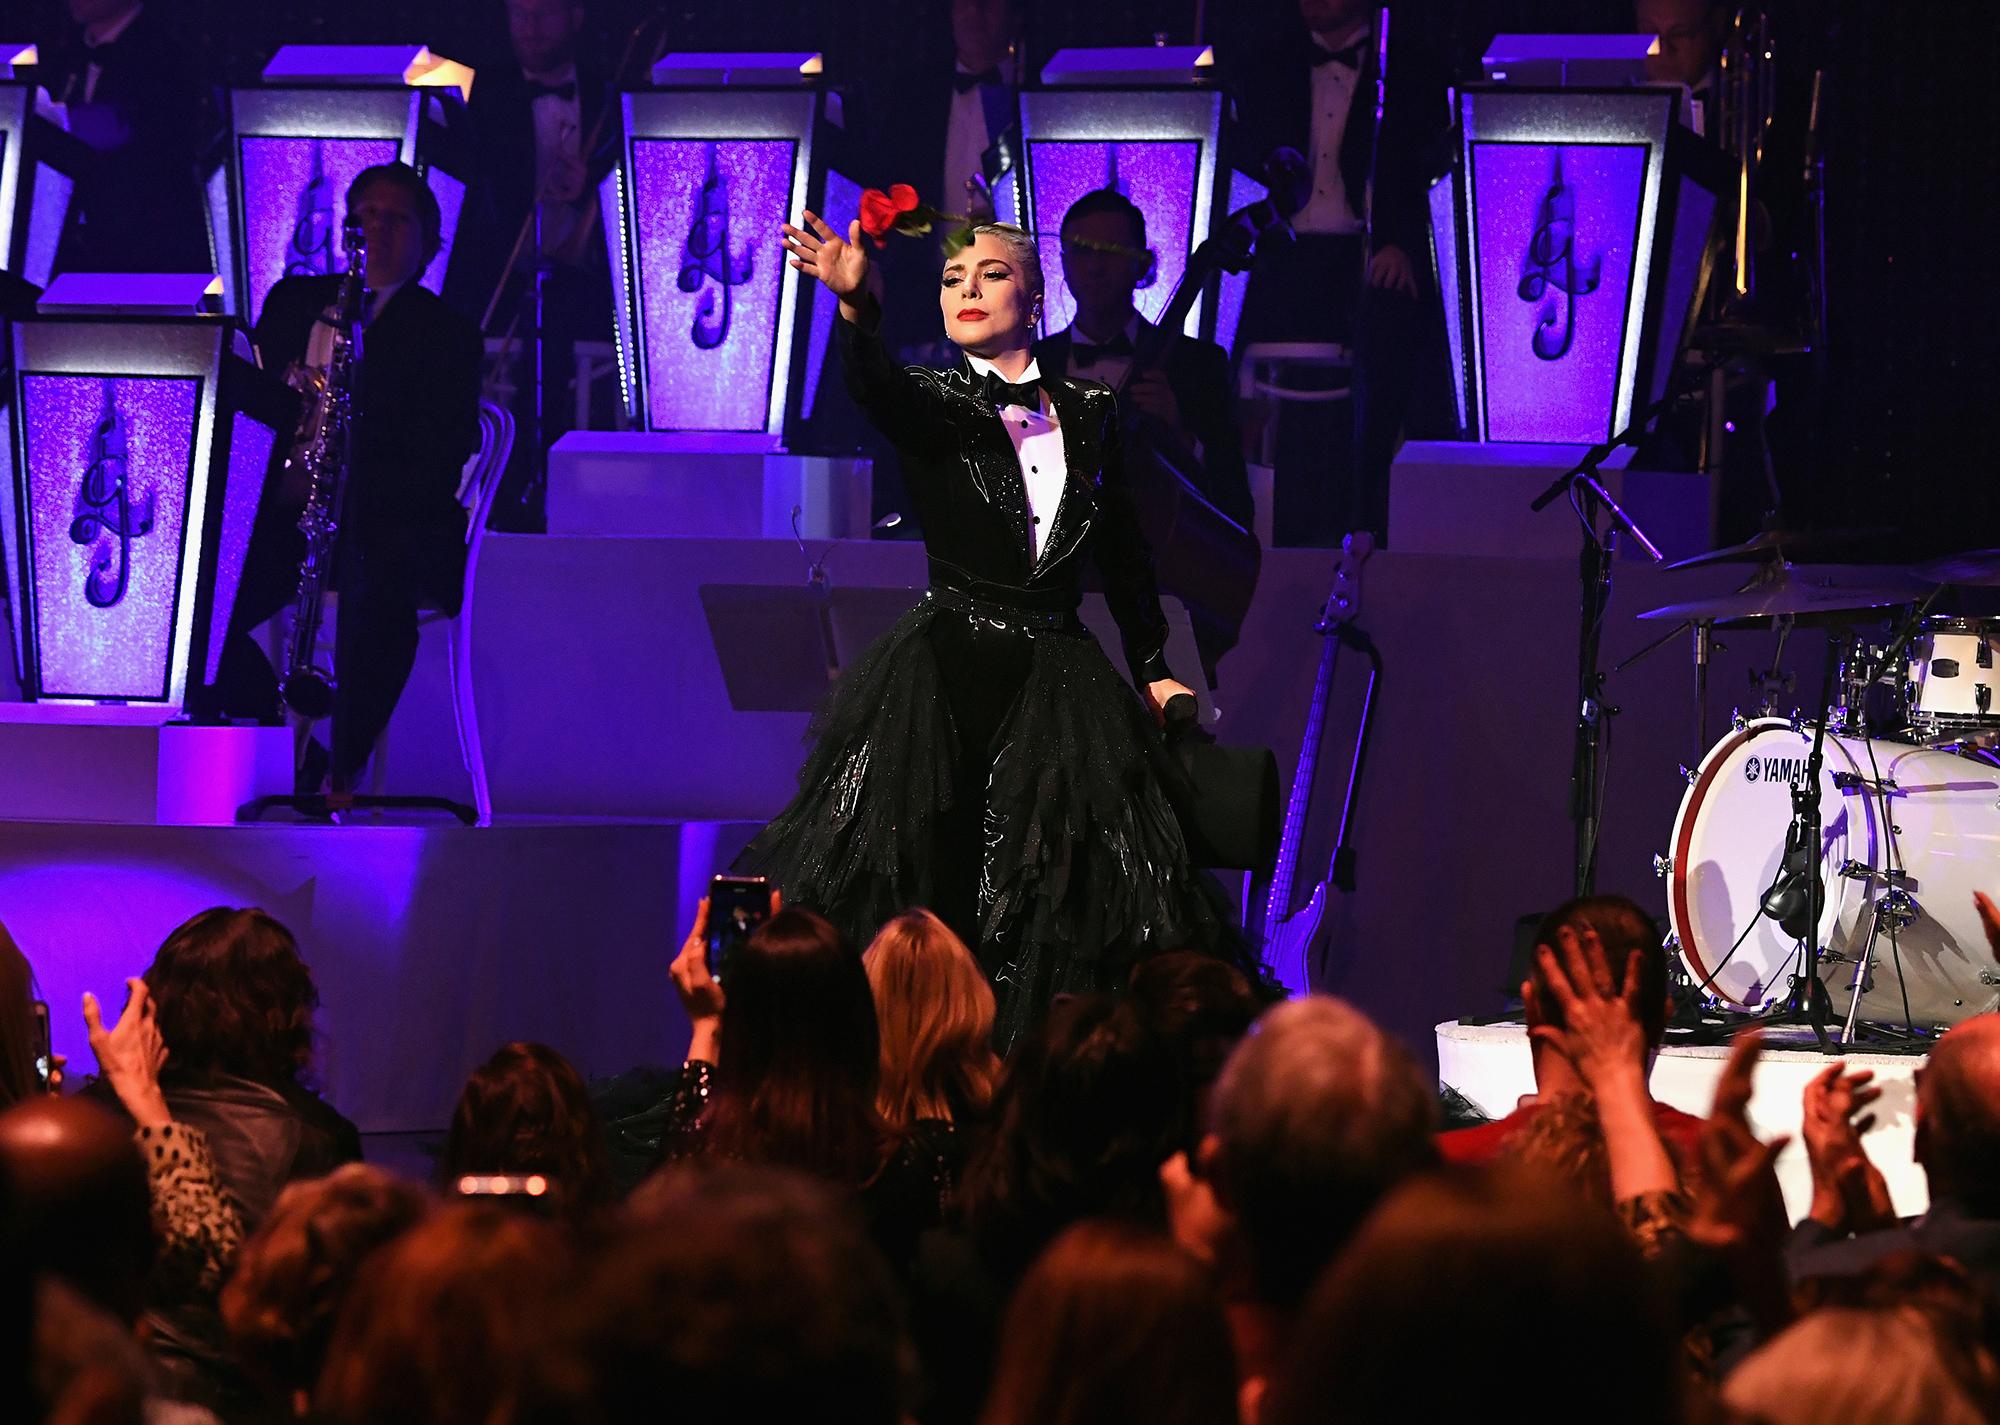 Lady-Gaga-Launches-Jazz-Piano-Las-Vegas-